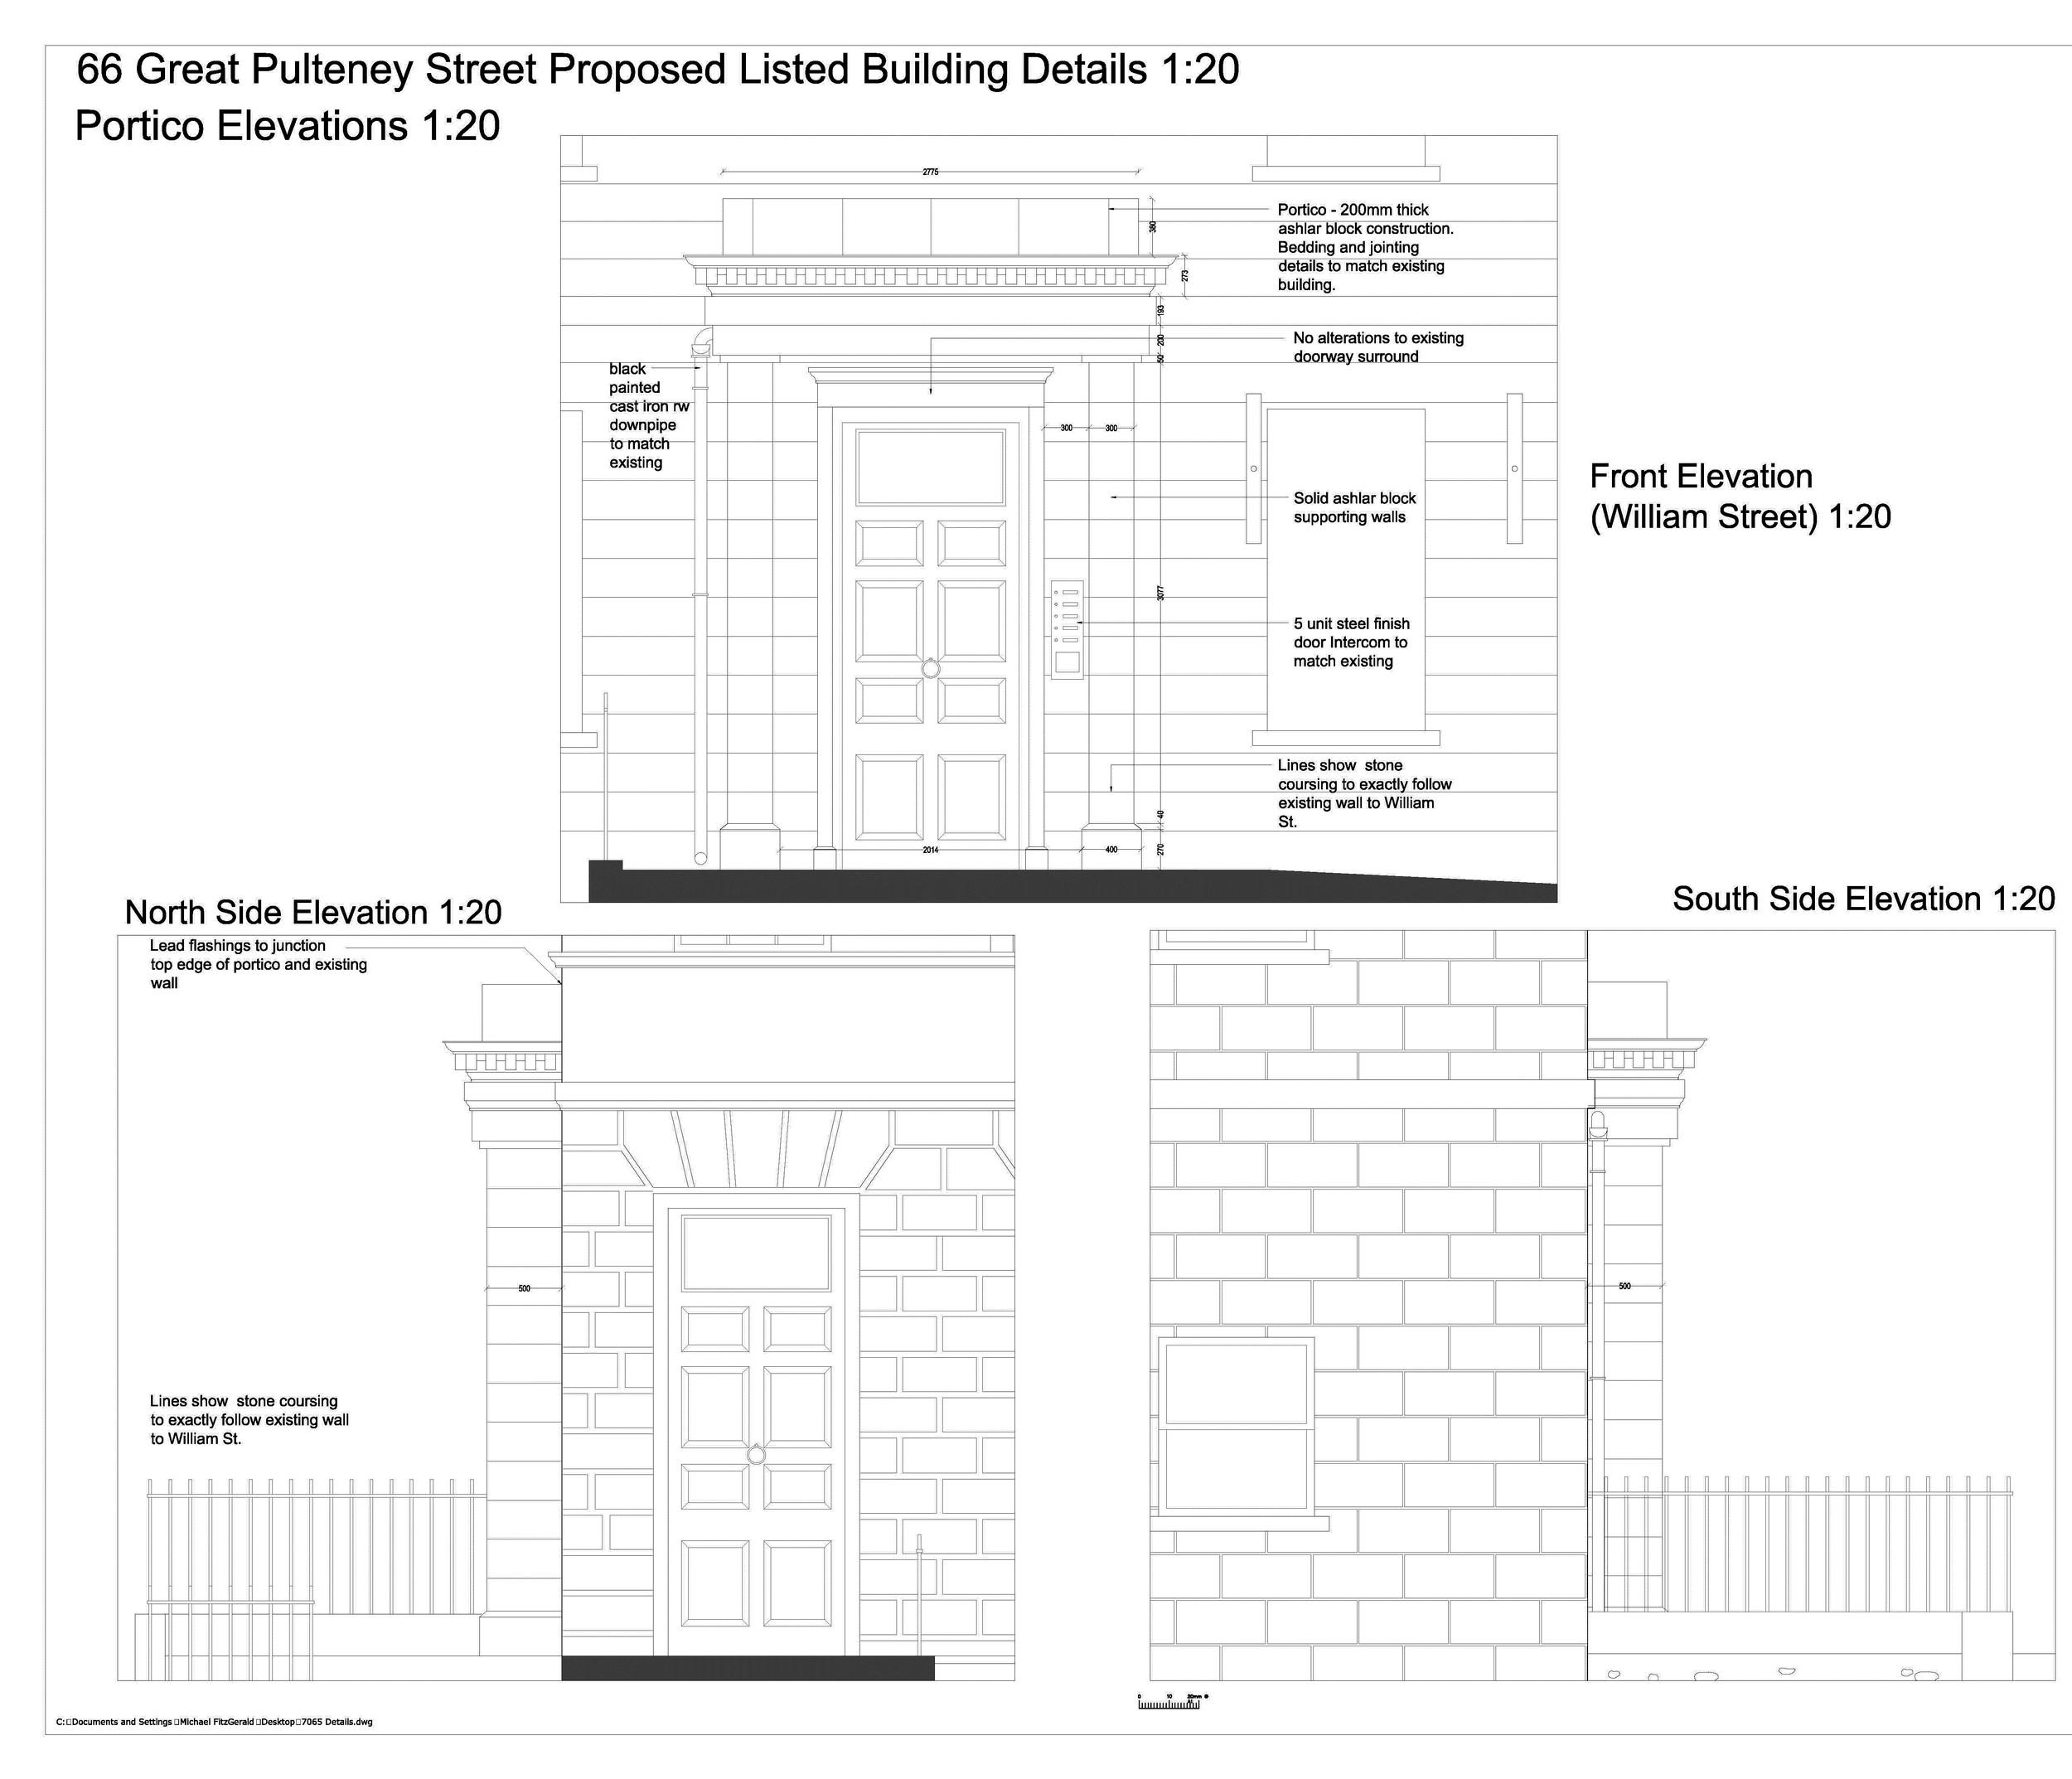 OTAL REFURBISHMENT ALL 6 FLOORS - 66 GREAT PULTNEY STREET, GRADE I LISTED BUILDINGBATH UK